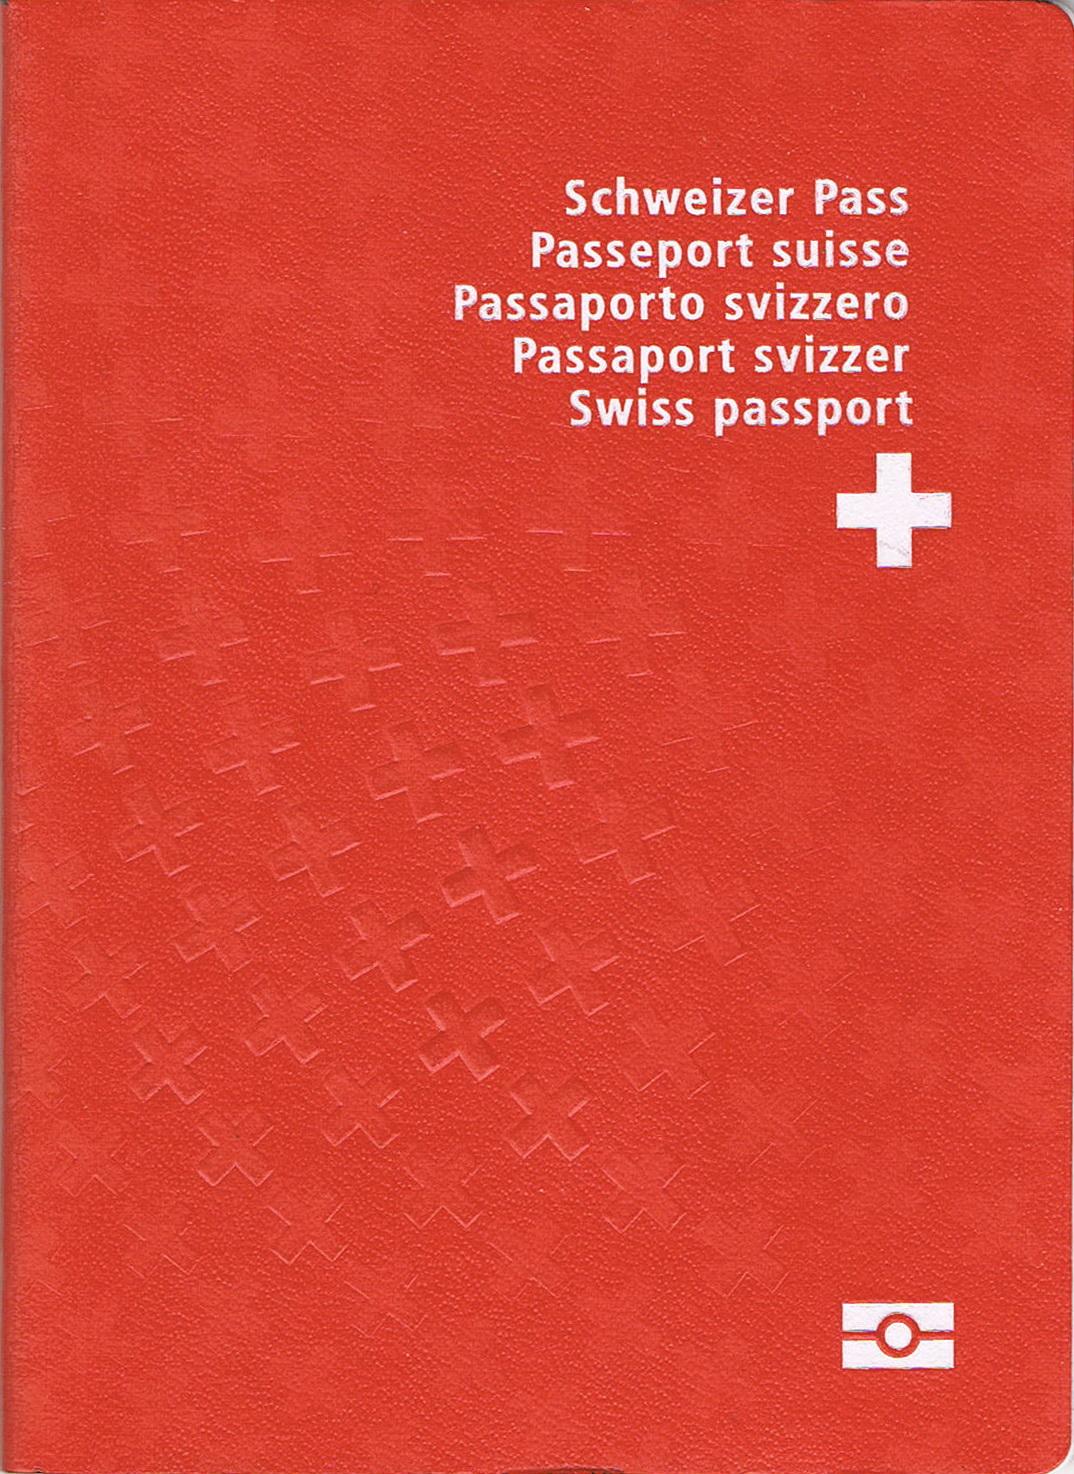 Swiss passport - Wikipedia